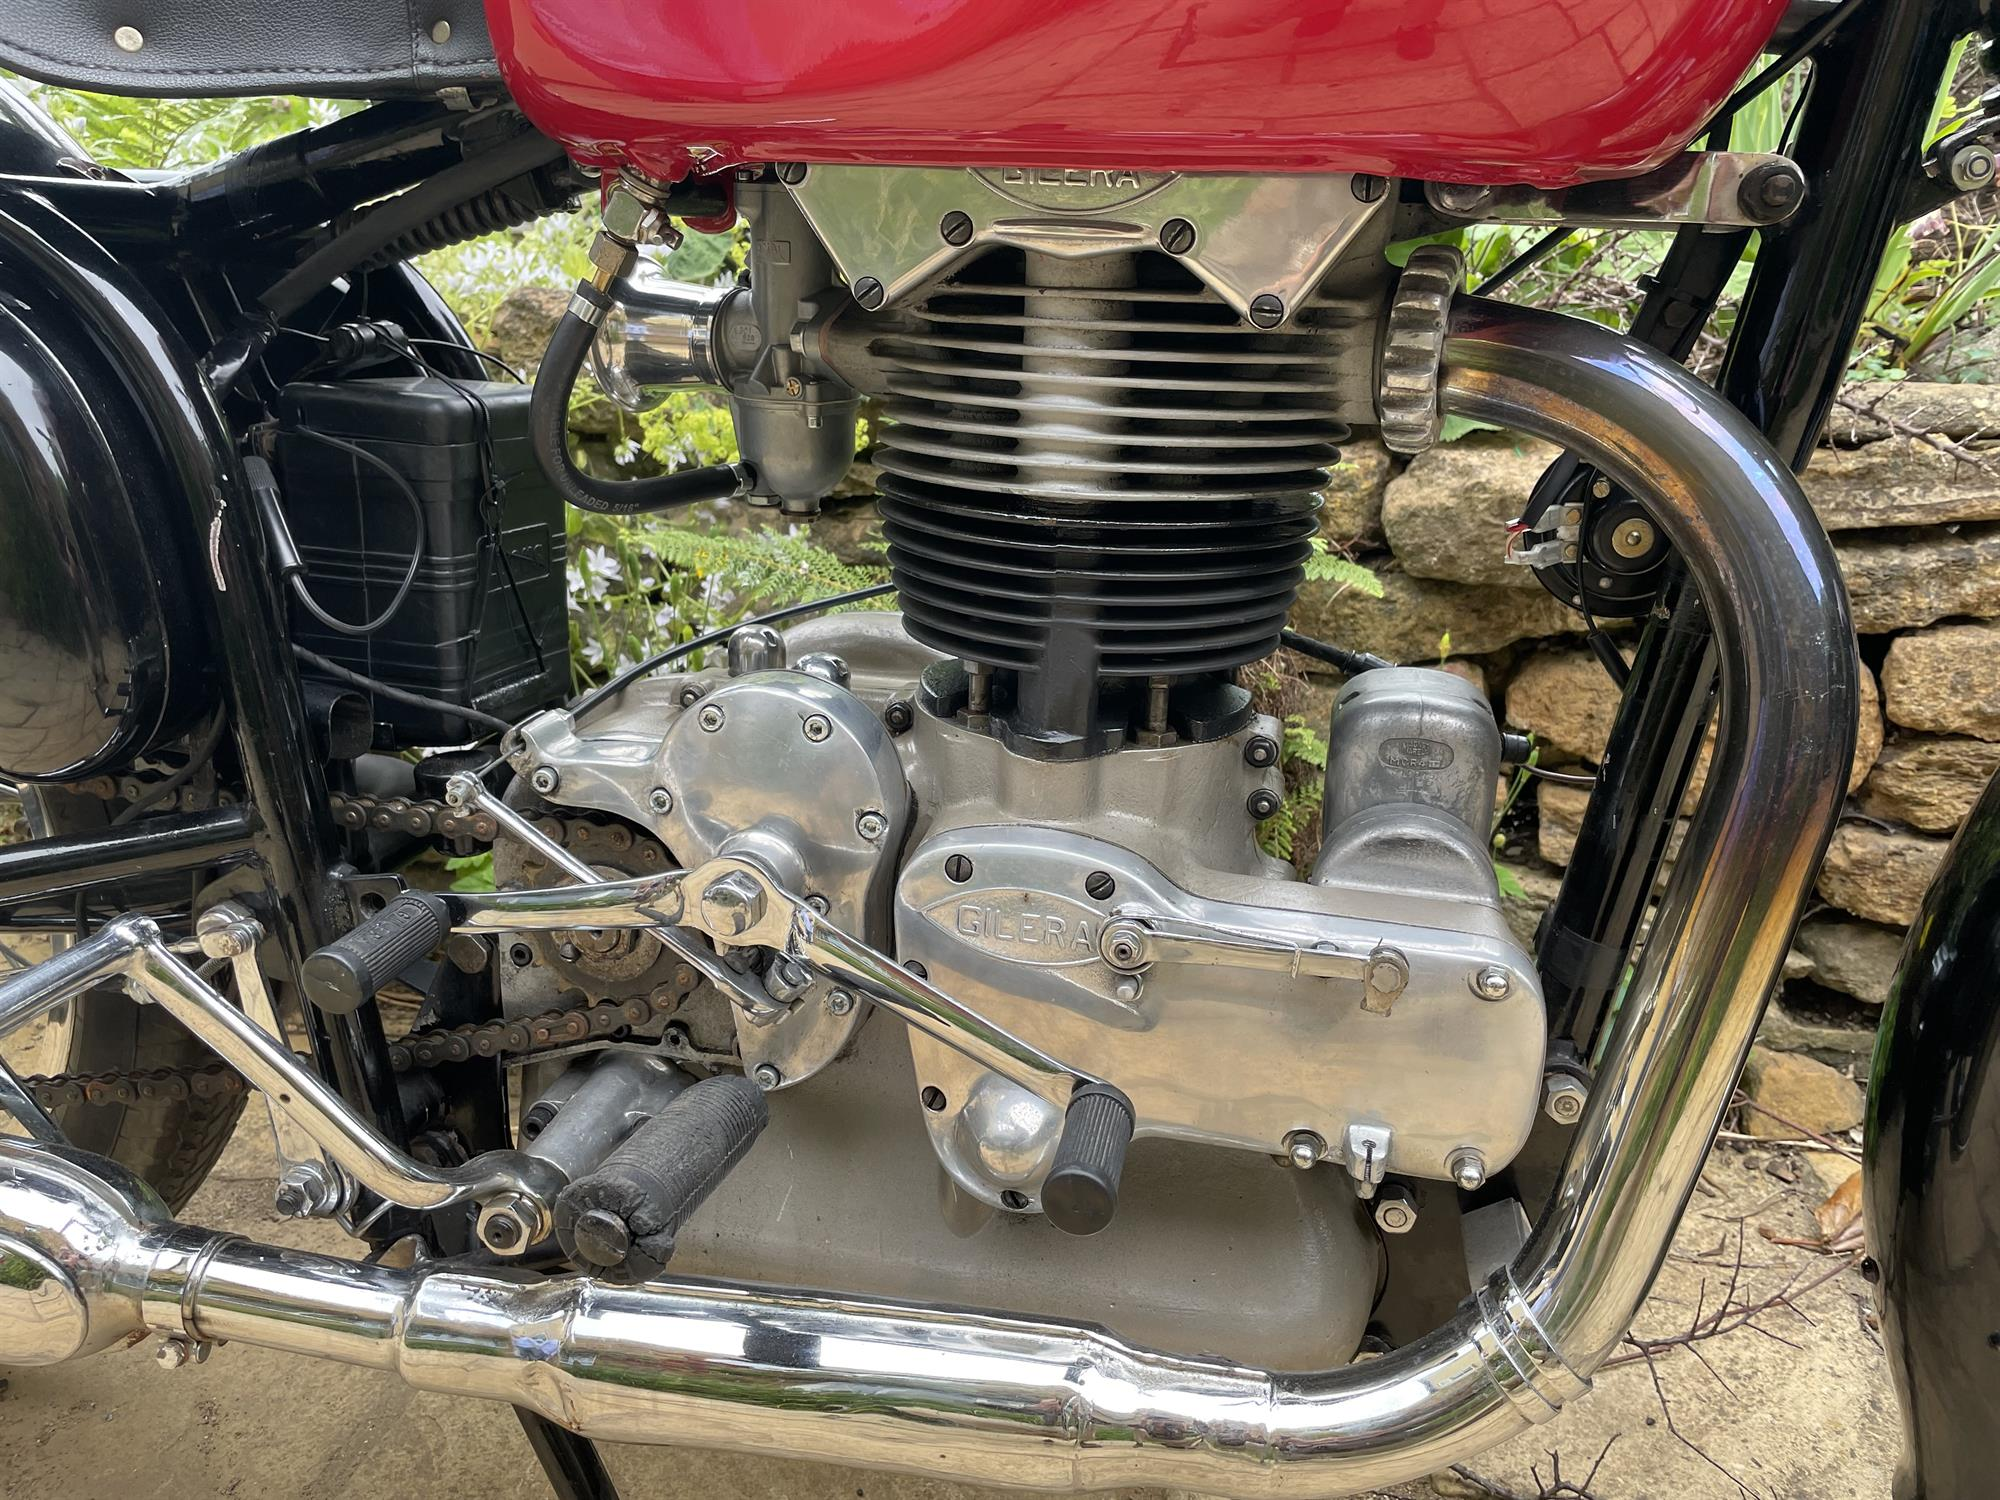 1954 Gilera Saturno Sport 500cc - Image 2 of 10